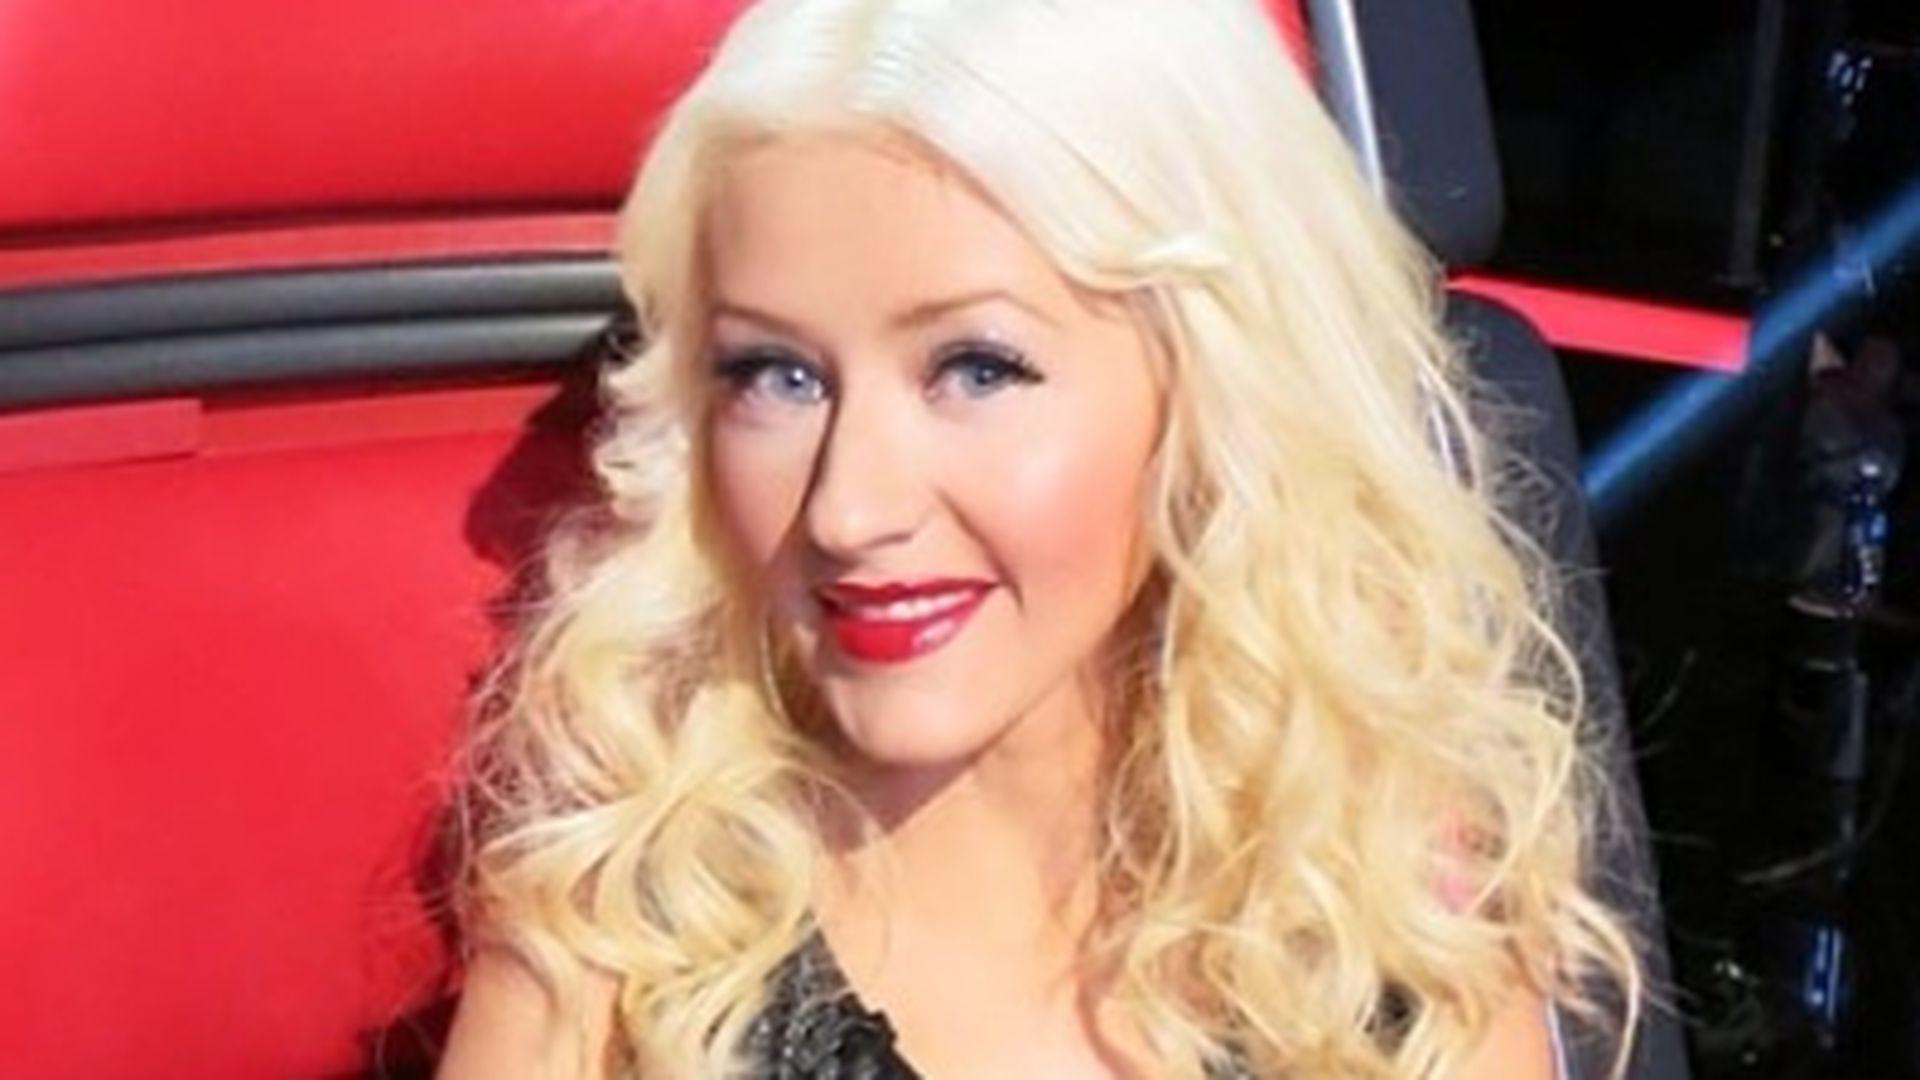 Christina Aguilera - Wallpaper von Christina Aguilera